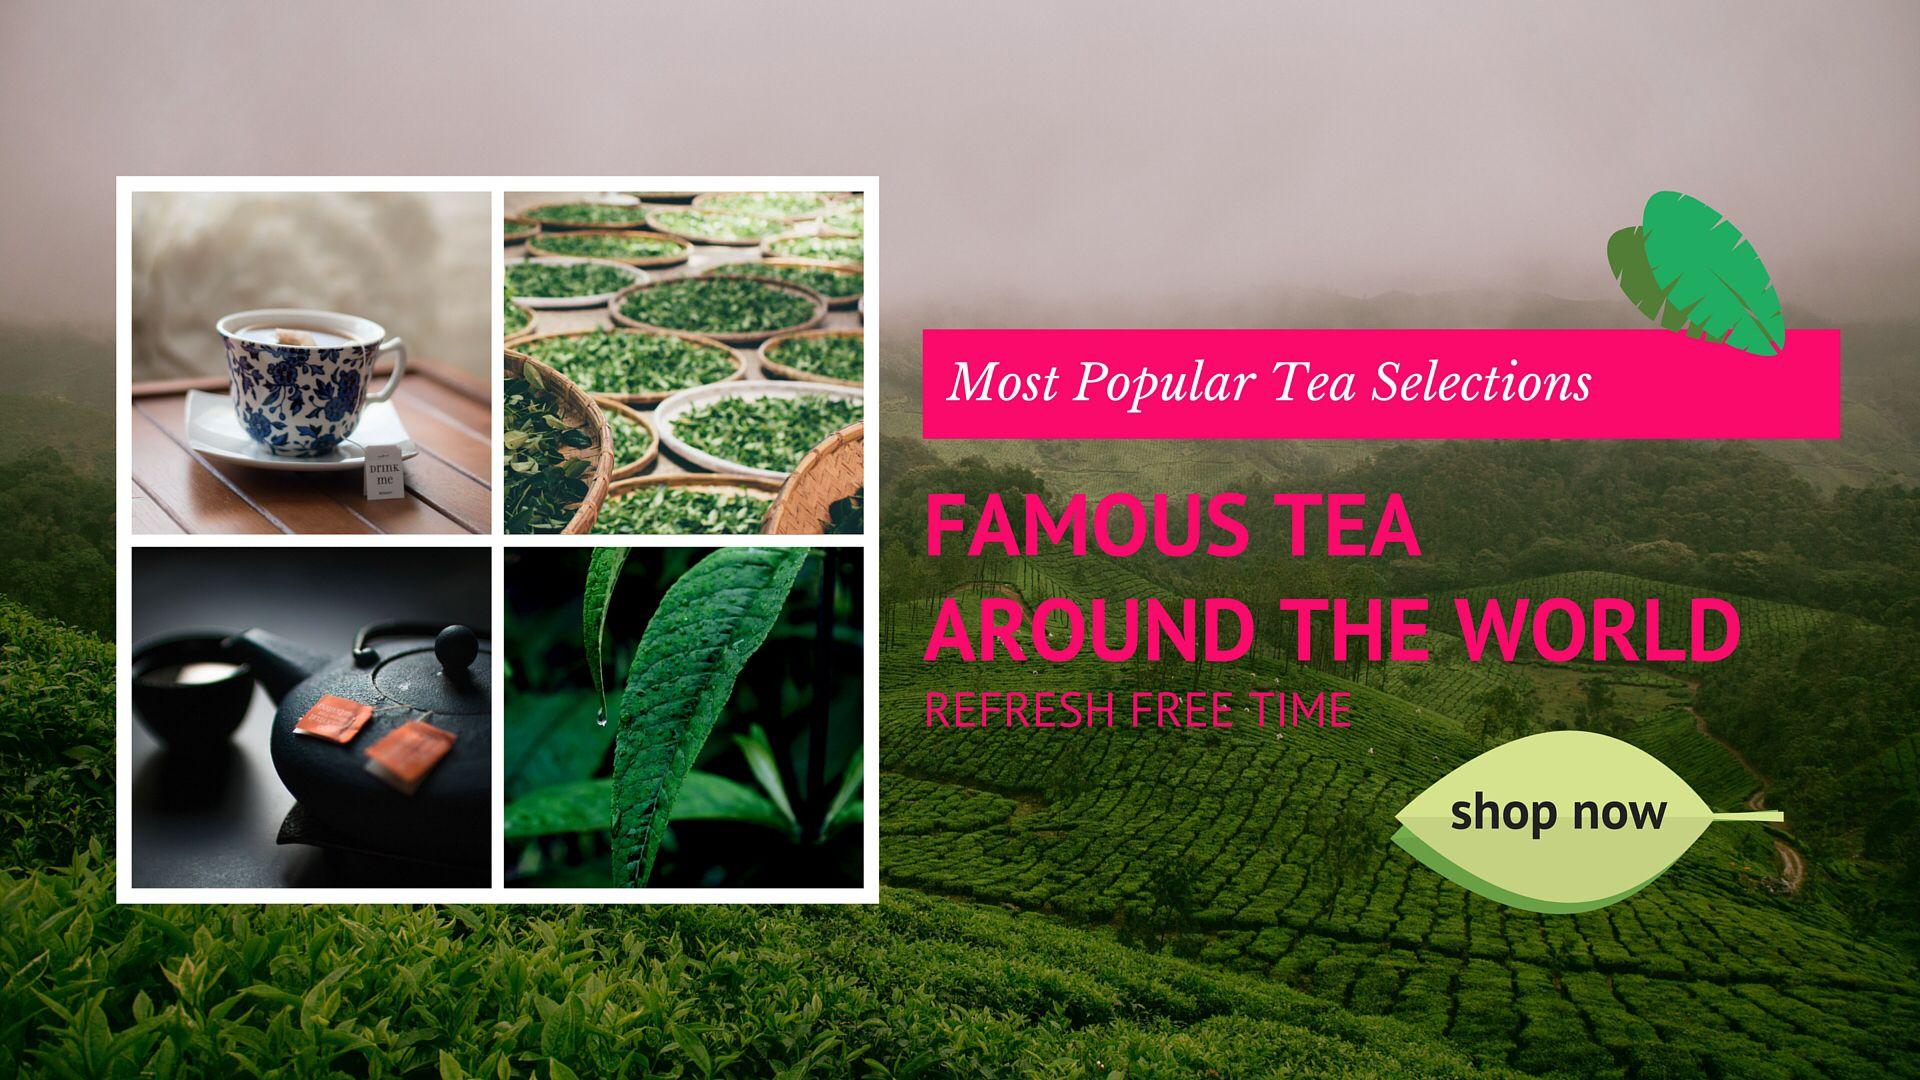 Pin by Charmerry on Tea Time Time shop, Tea time, Tea